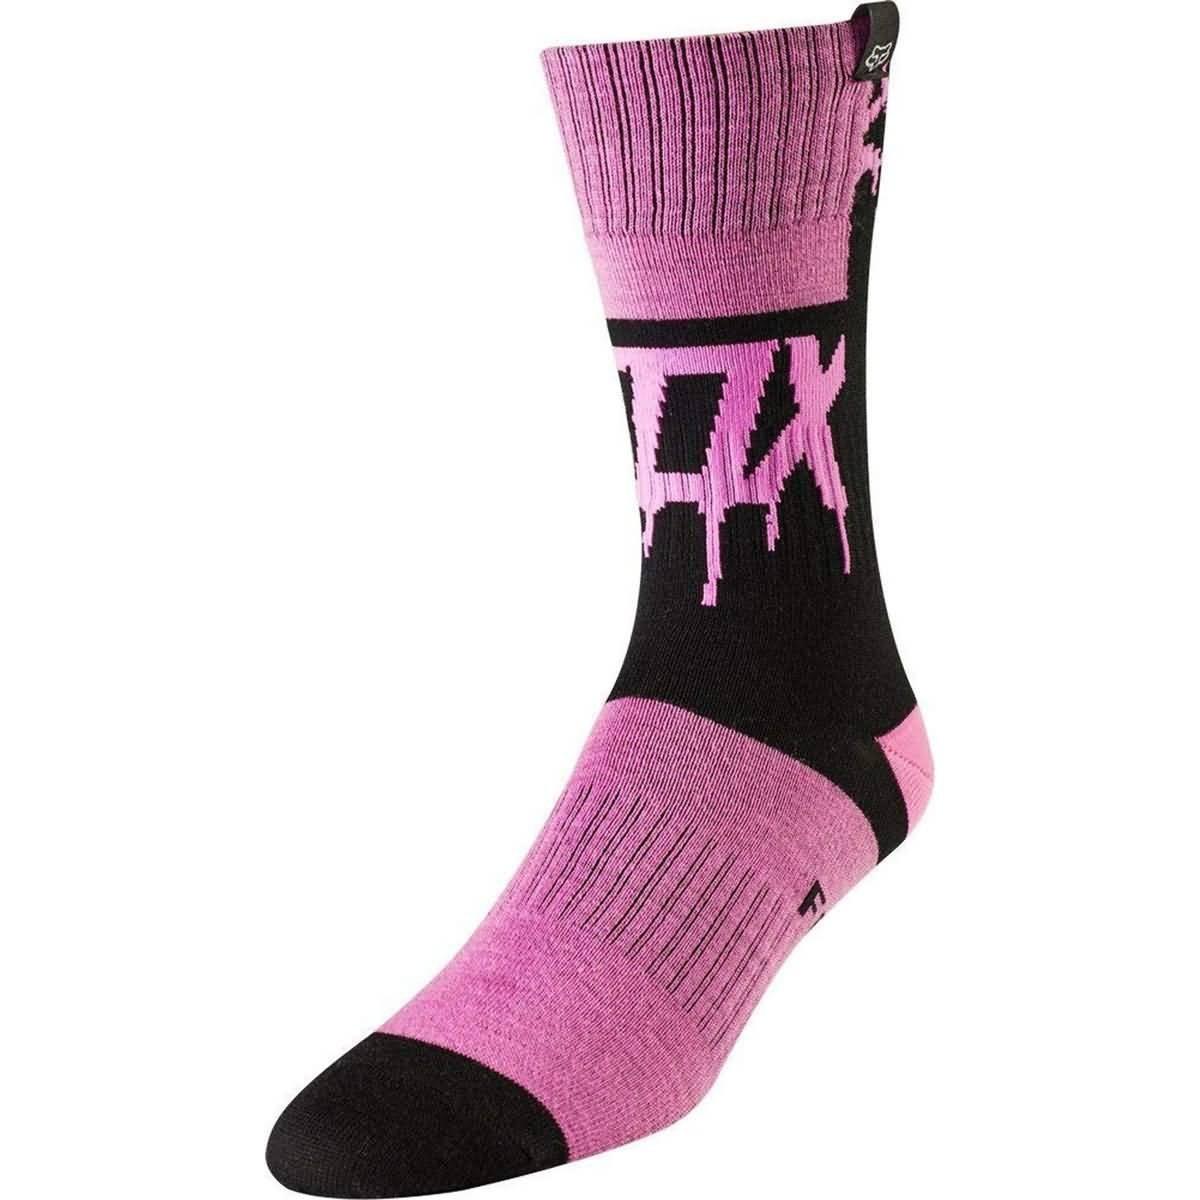 Fox Racing 2019 Girl's MX Socks - Mata Drip (LARGE) (BLACK/PINK) by Fox Racing